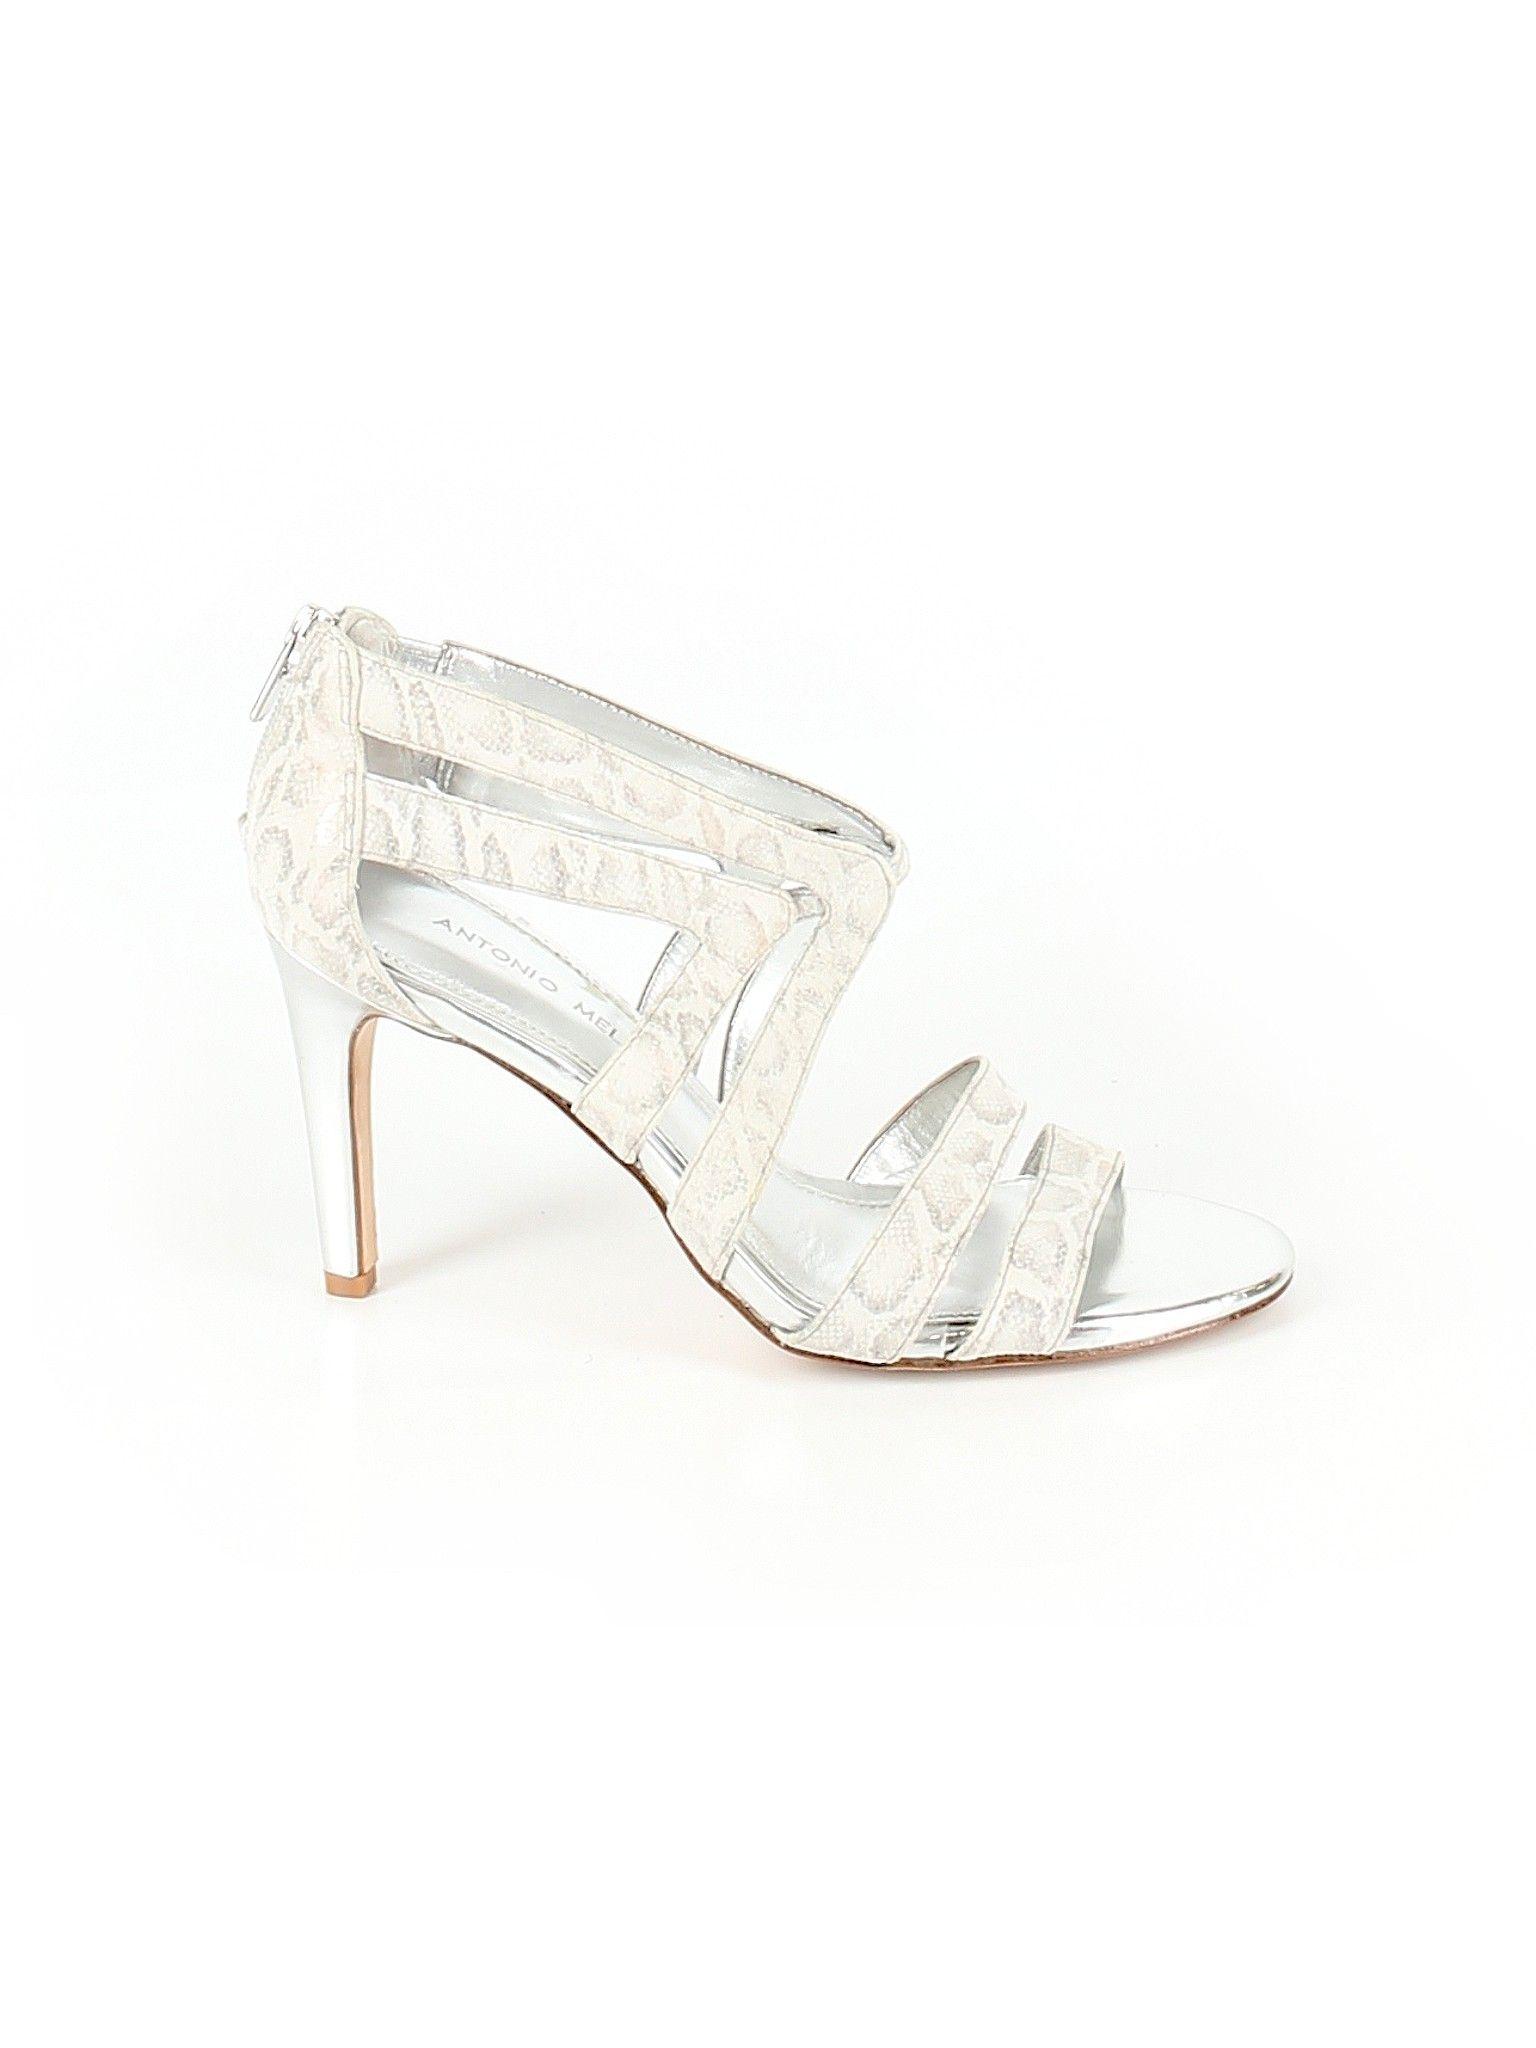 Antonio Melani Heel Silver Print Women S Shoes Size 8 1 2 Heels Second Hand Clothes Women Shoes